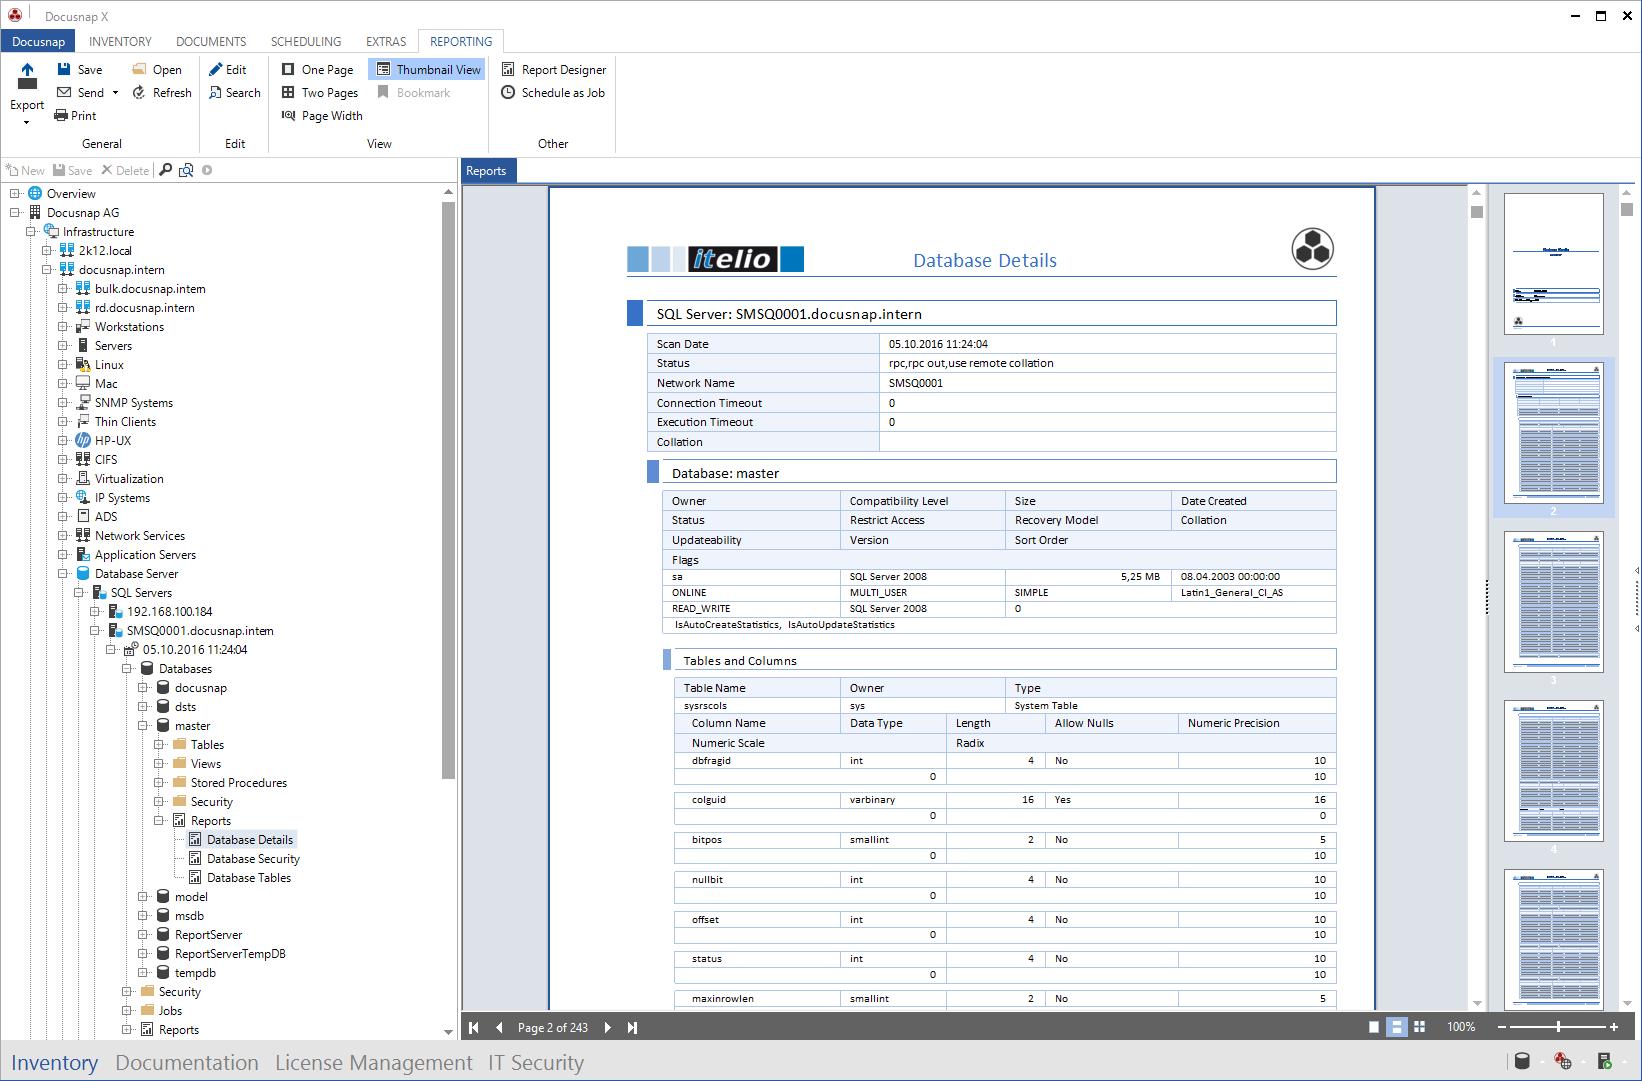 Report Database Details